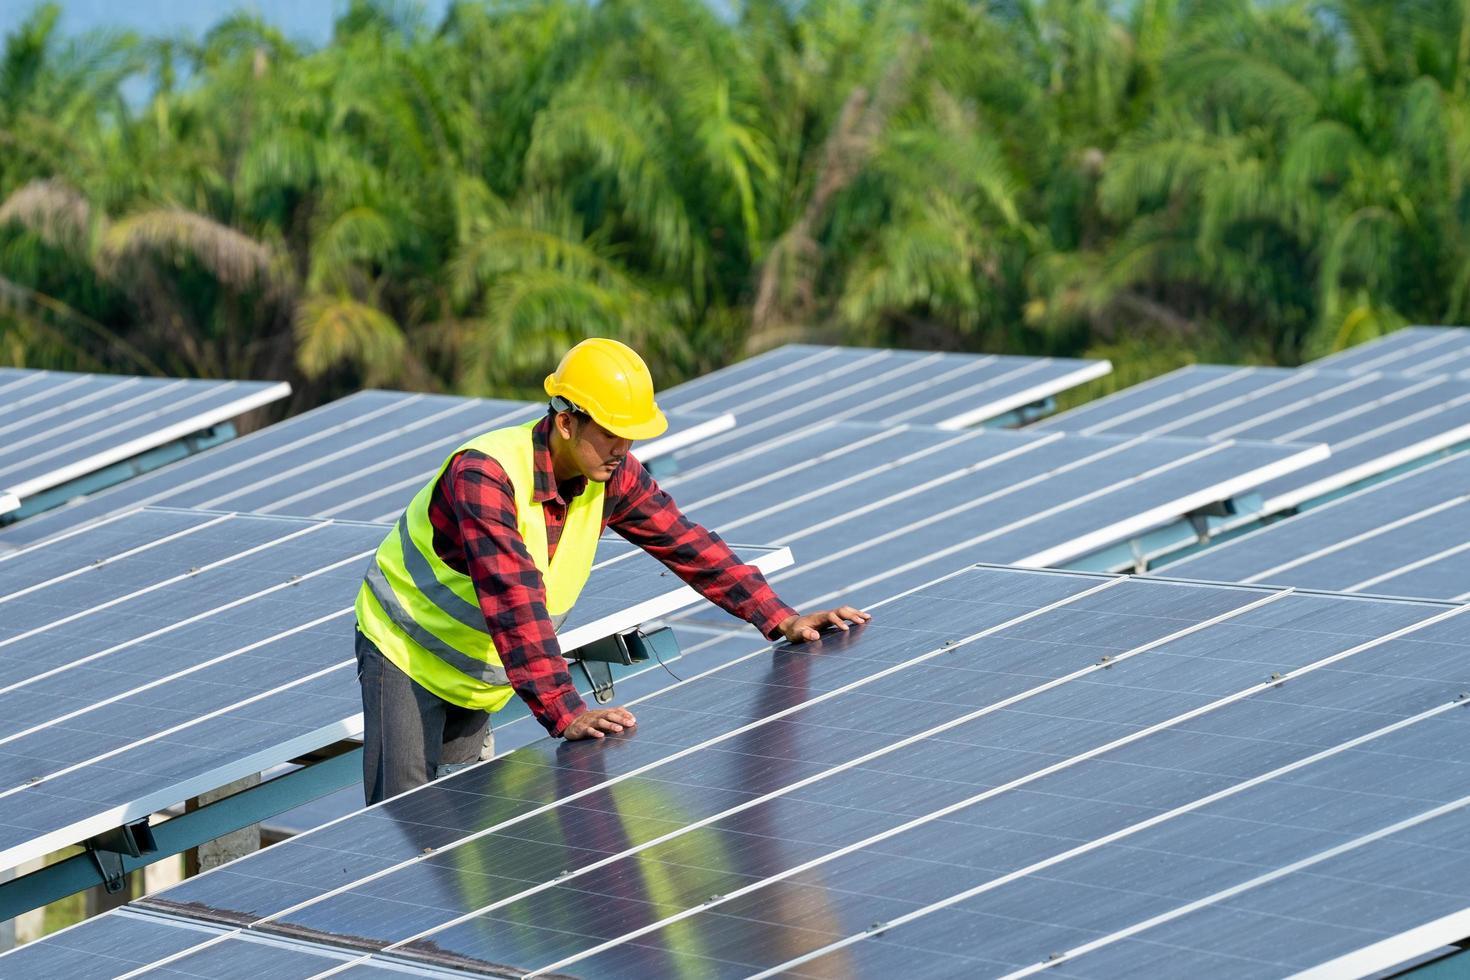 Ingenieur arbeitet an Sonnenkollektoren foto